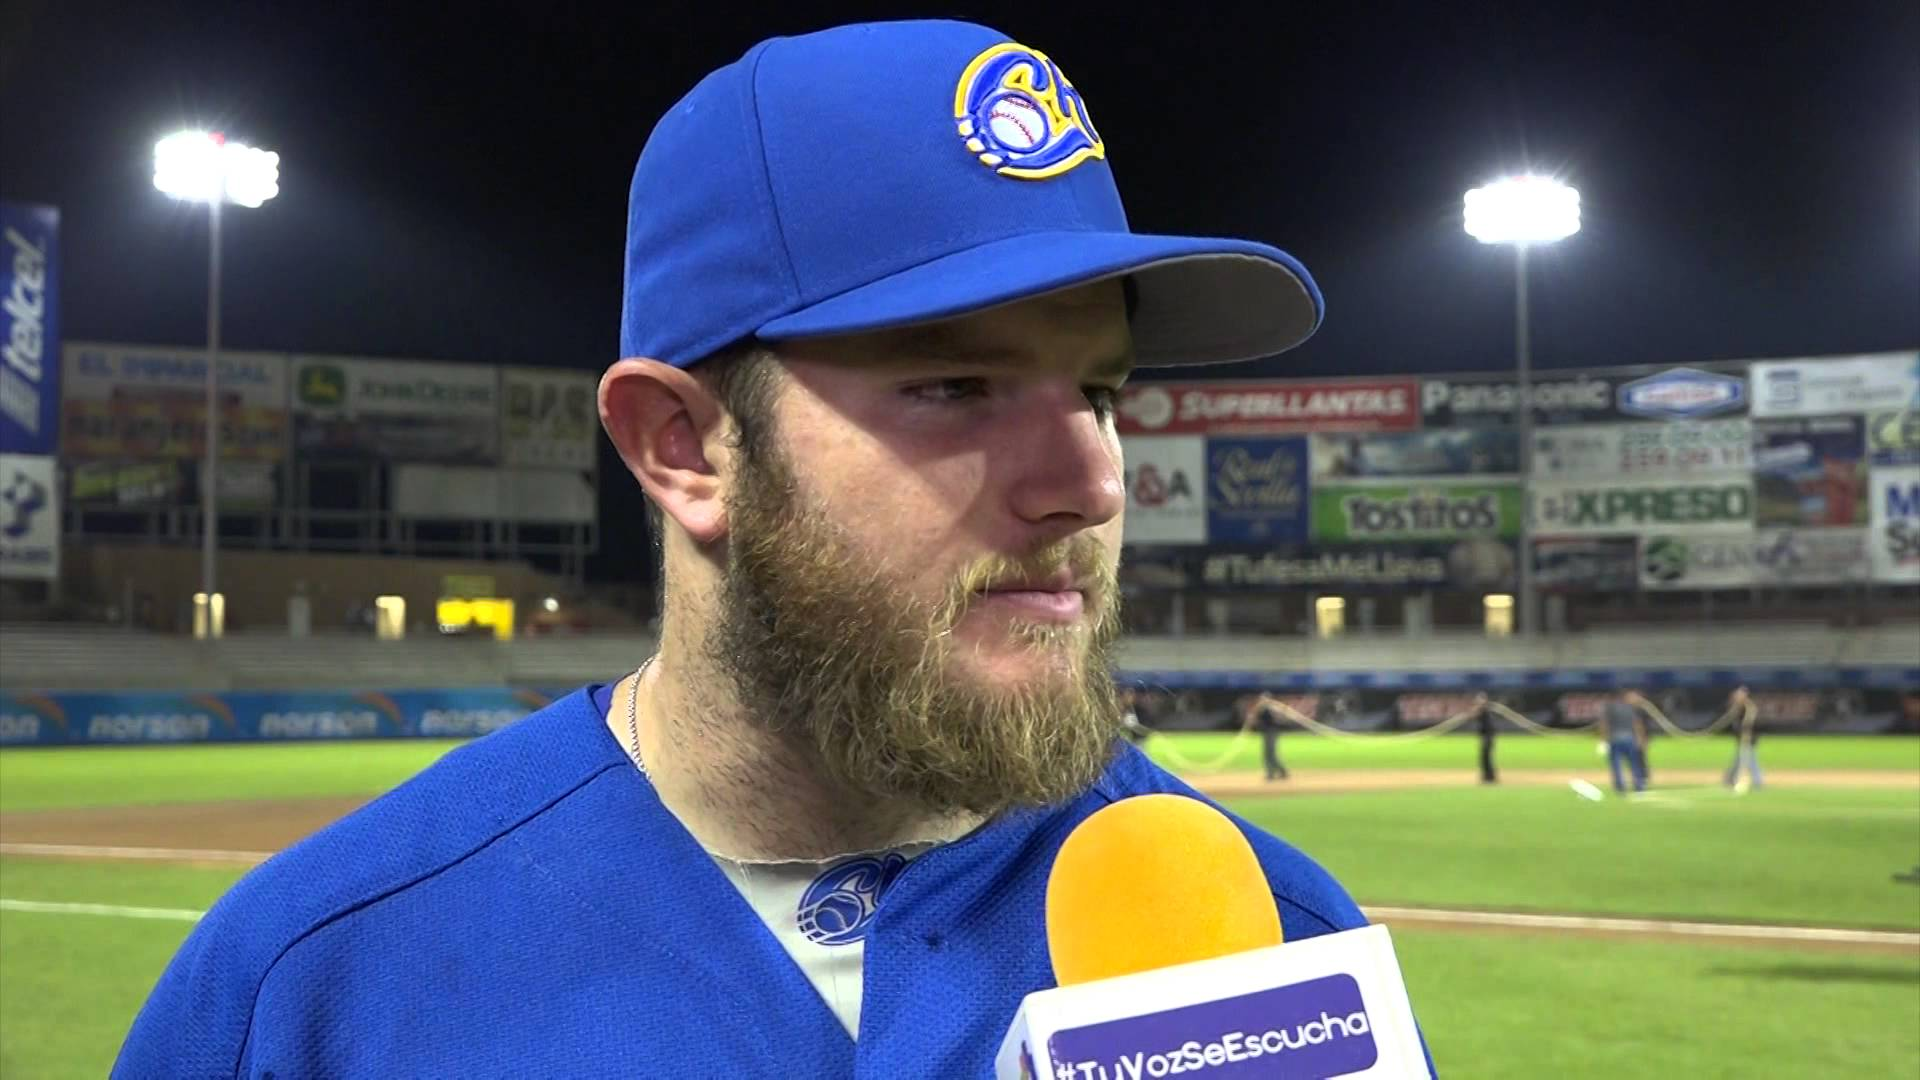 Max Muncy, Charros Pacífico, Liga Pacífico, Dodgers Los Pleyers